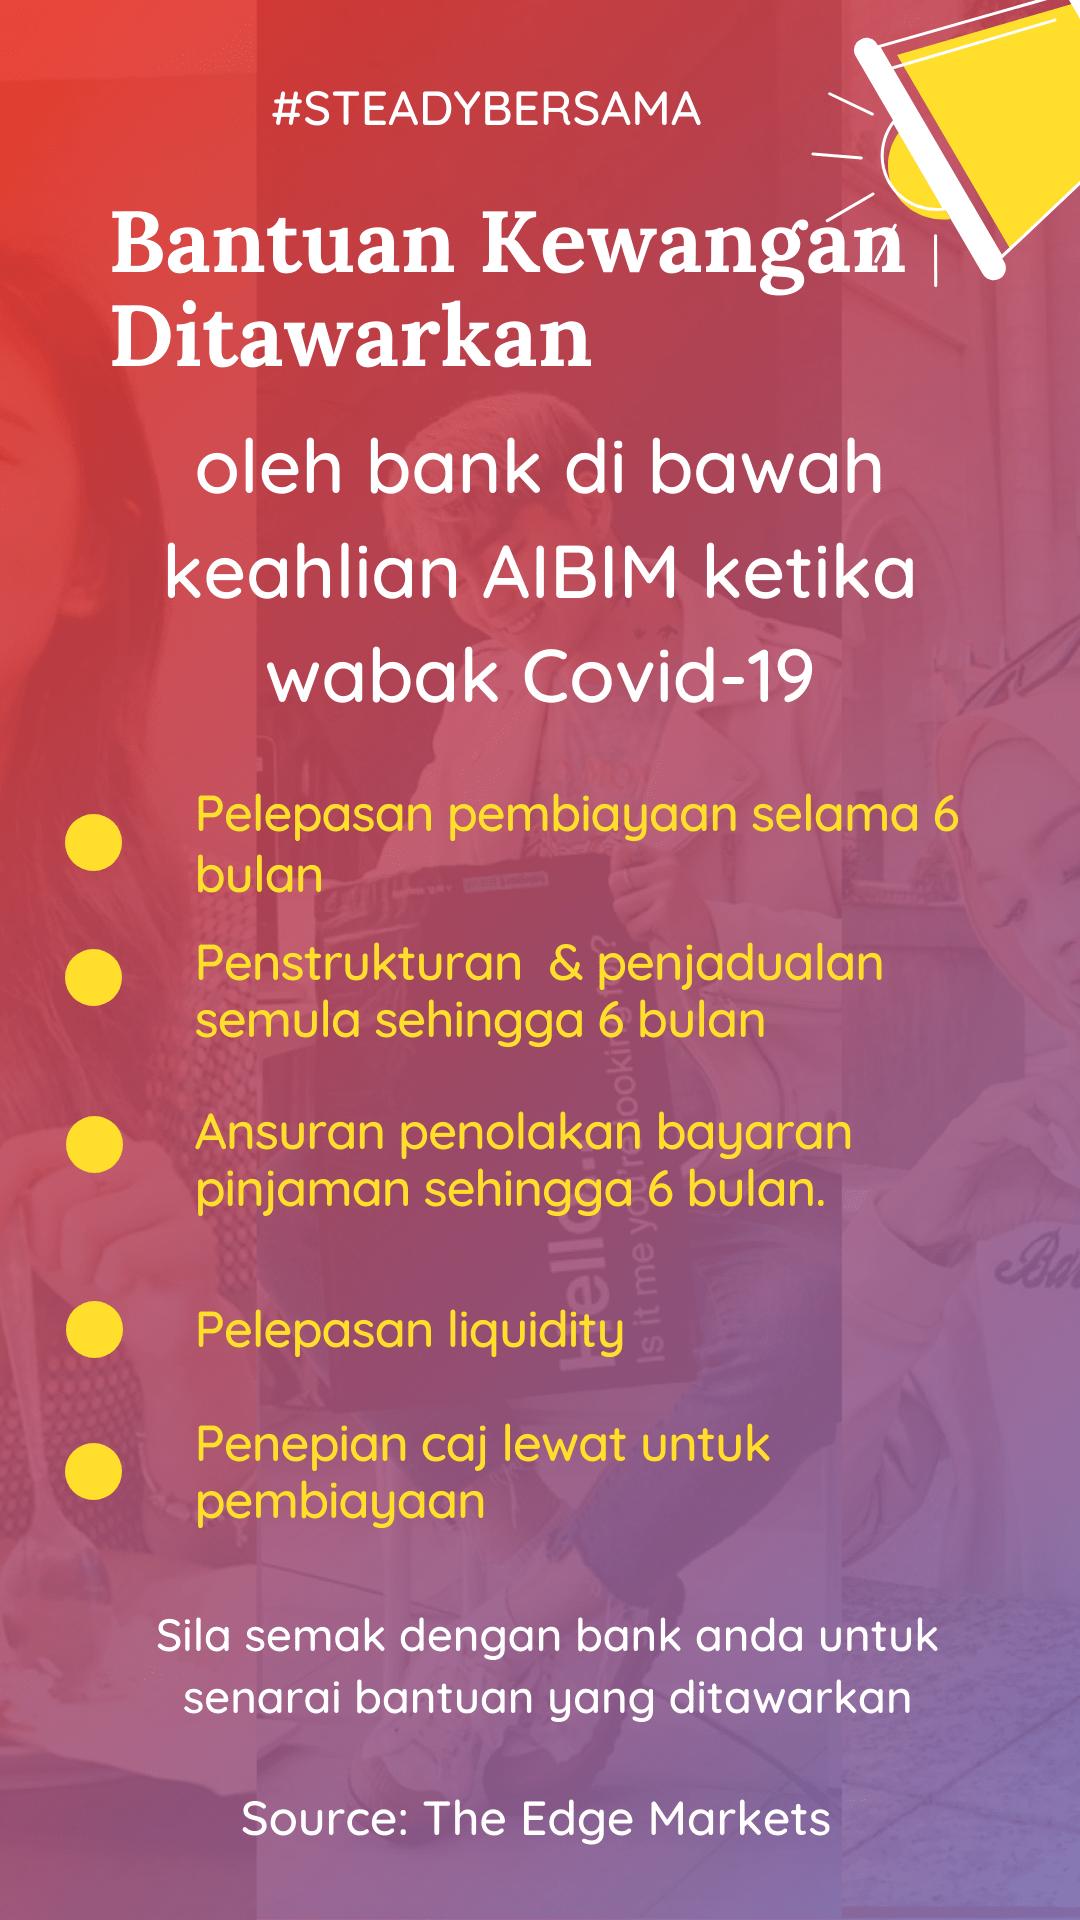 Material - SushiVid+Covid+19+Aid+-+AIBIM+(Malay)